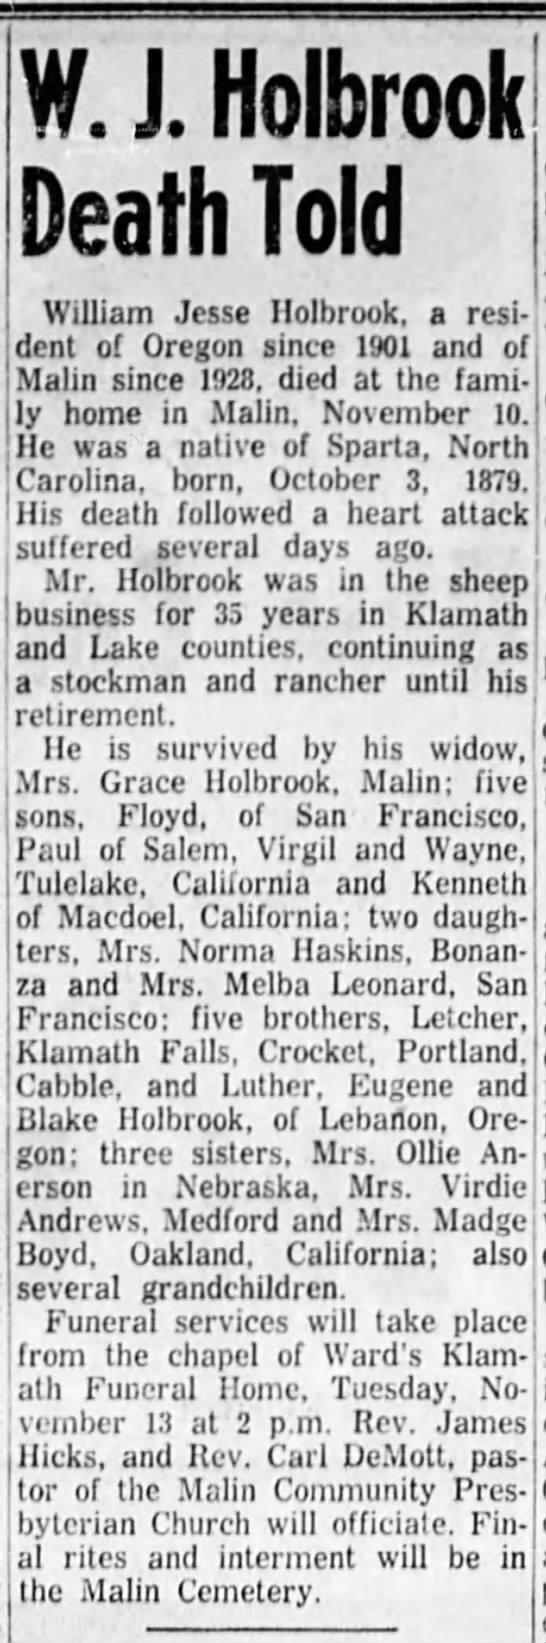 William Jesse Holbrook OBITUARY 1956 - W. J. Holbrook Death Told I William Jesse...